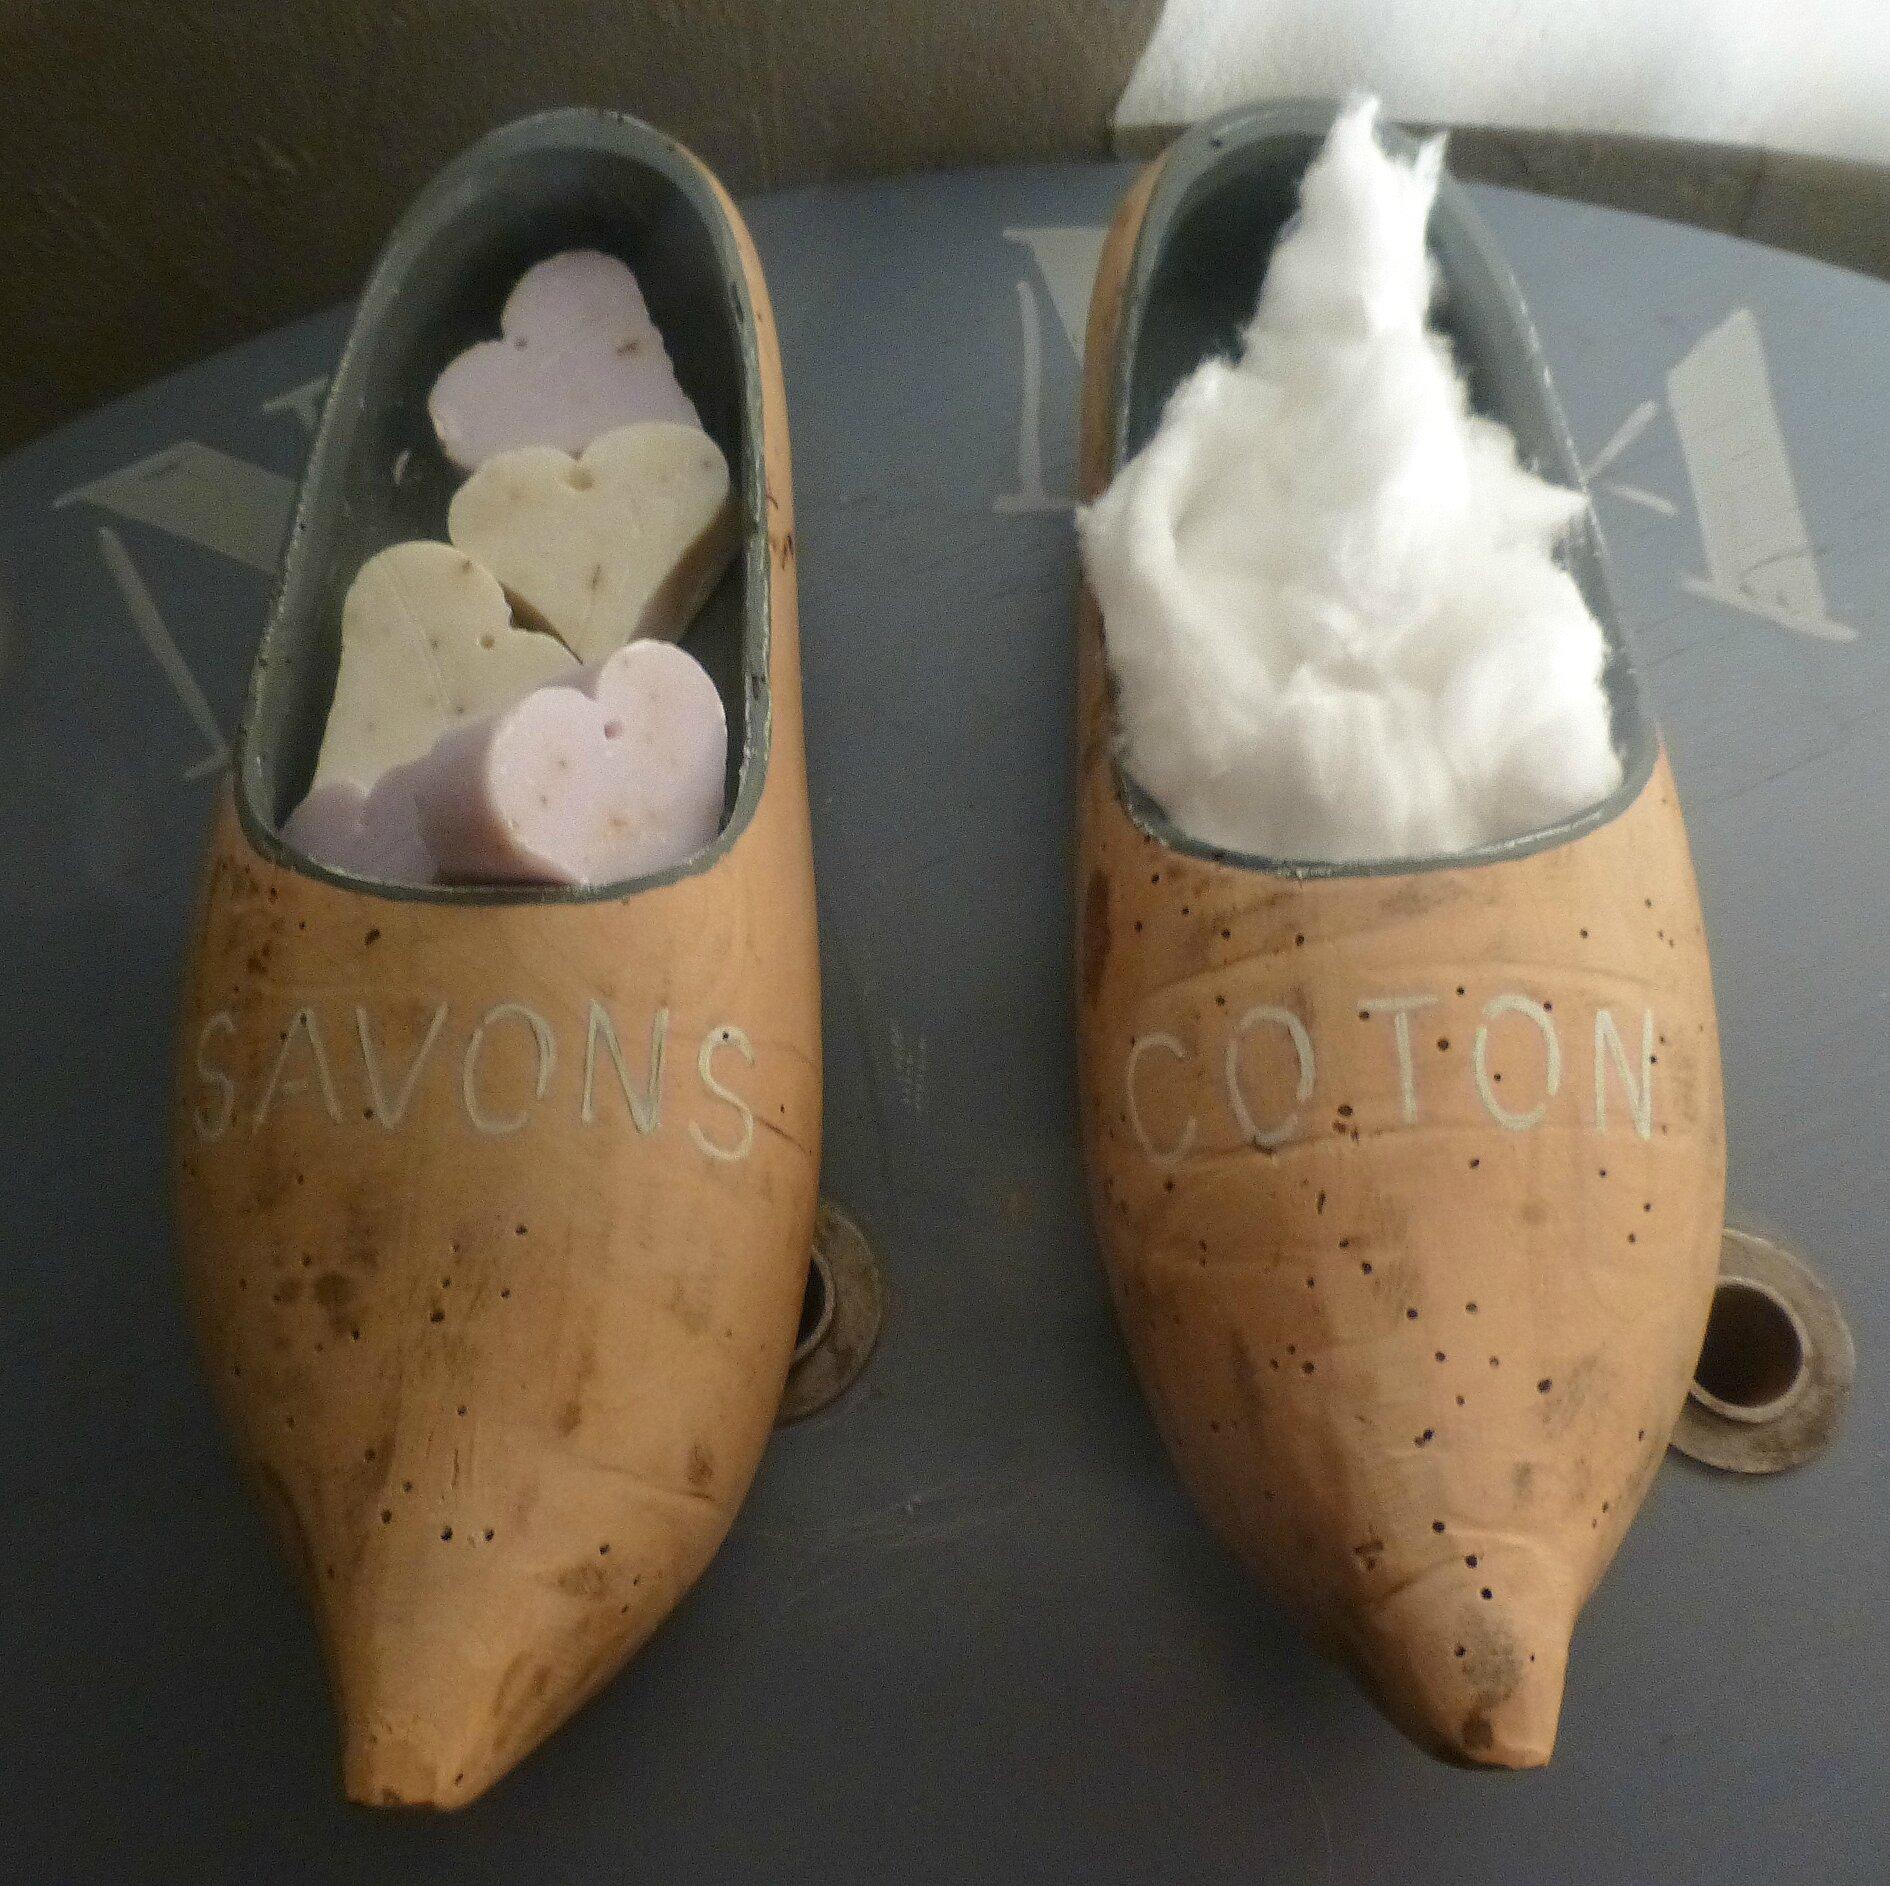 porte-savon et porte-coton sabot